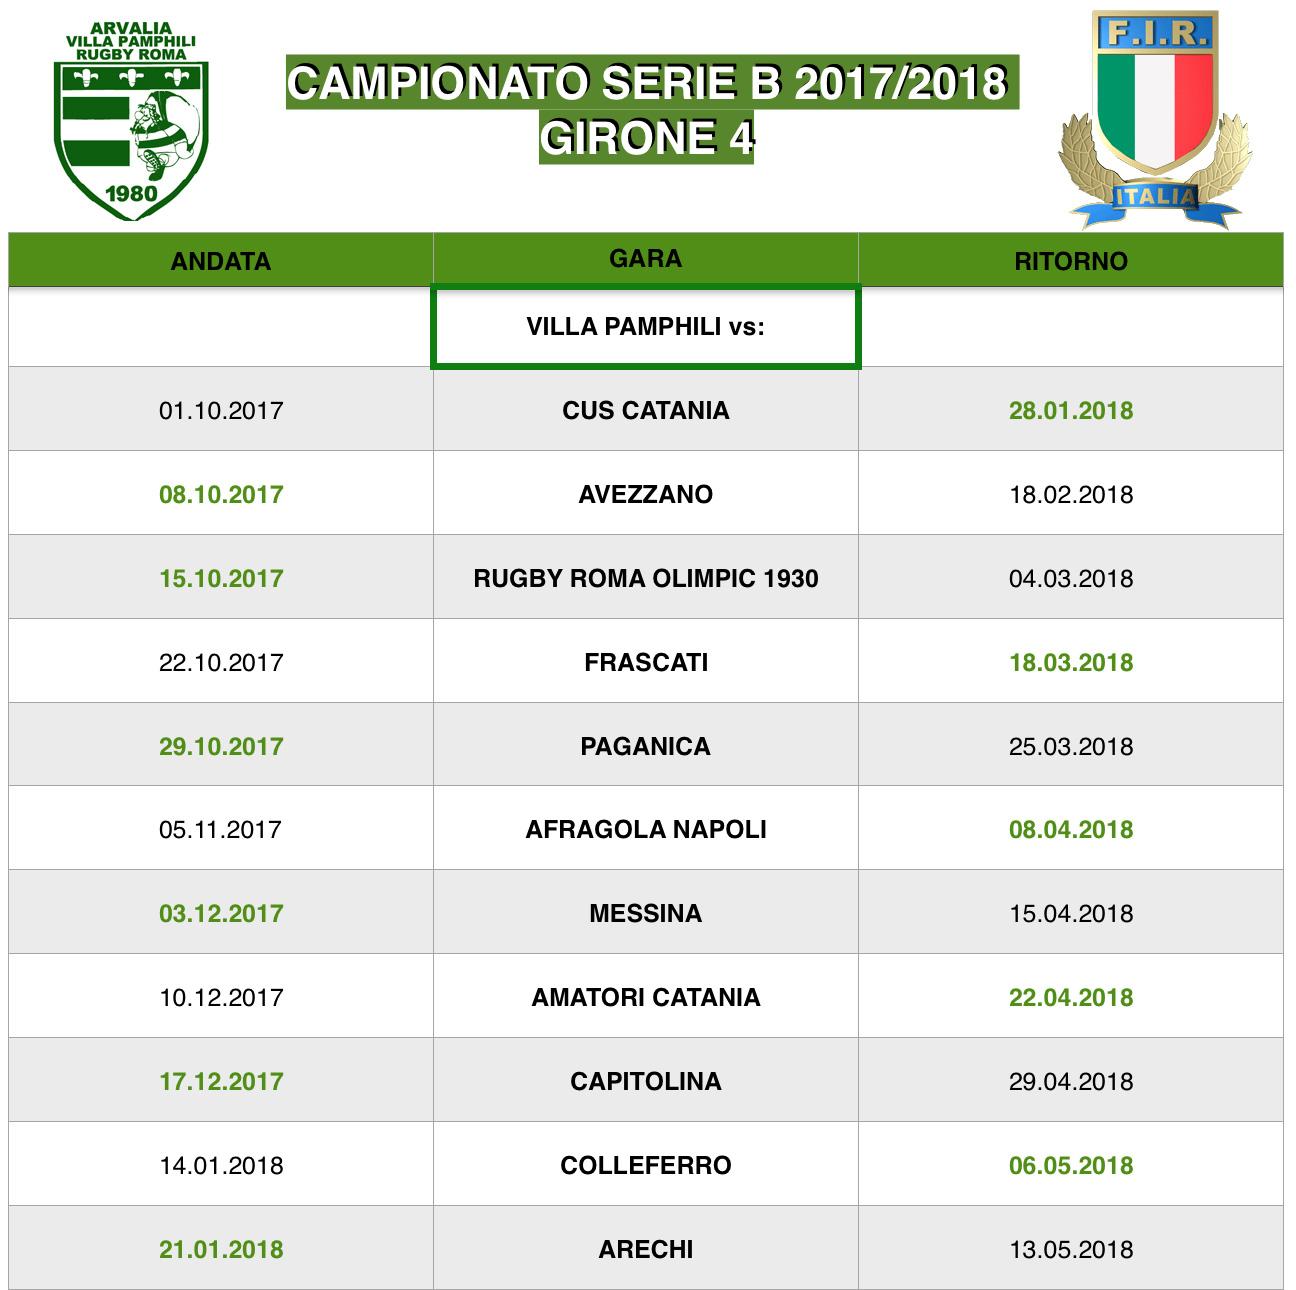 Rugby 6 Nazioni Calendario.Calendario Villa Pamphili Serie B 2017 2018